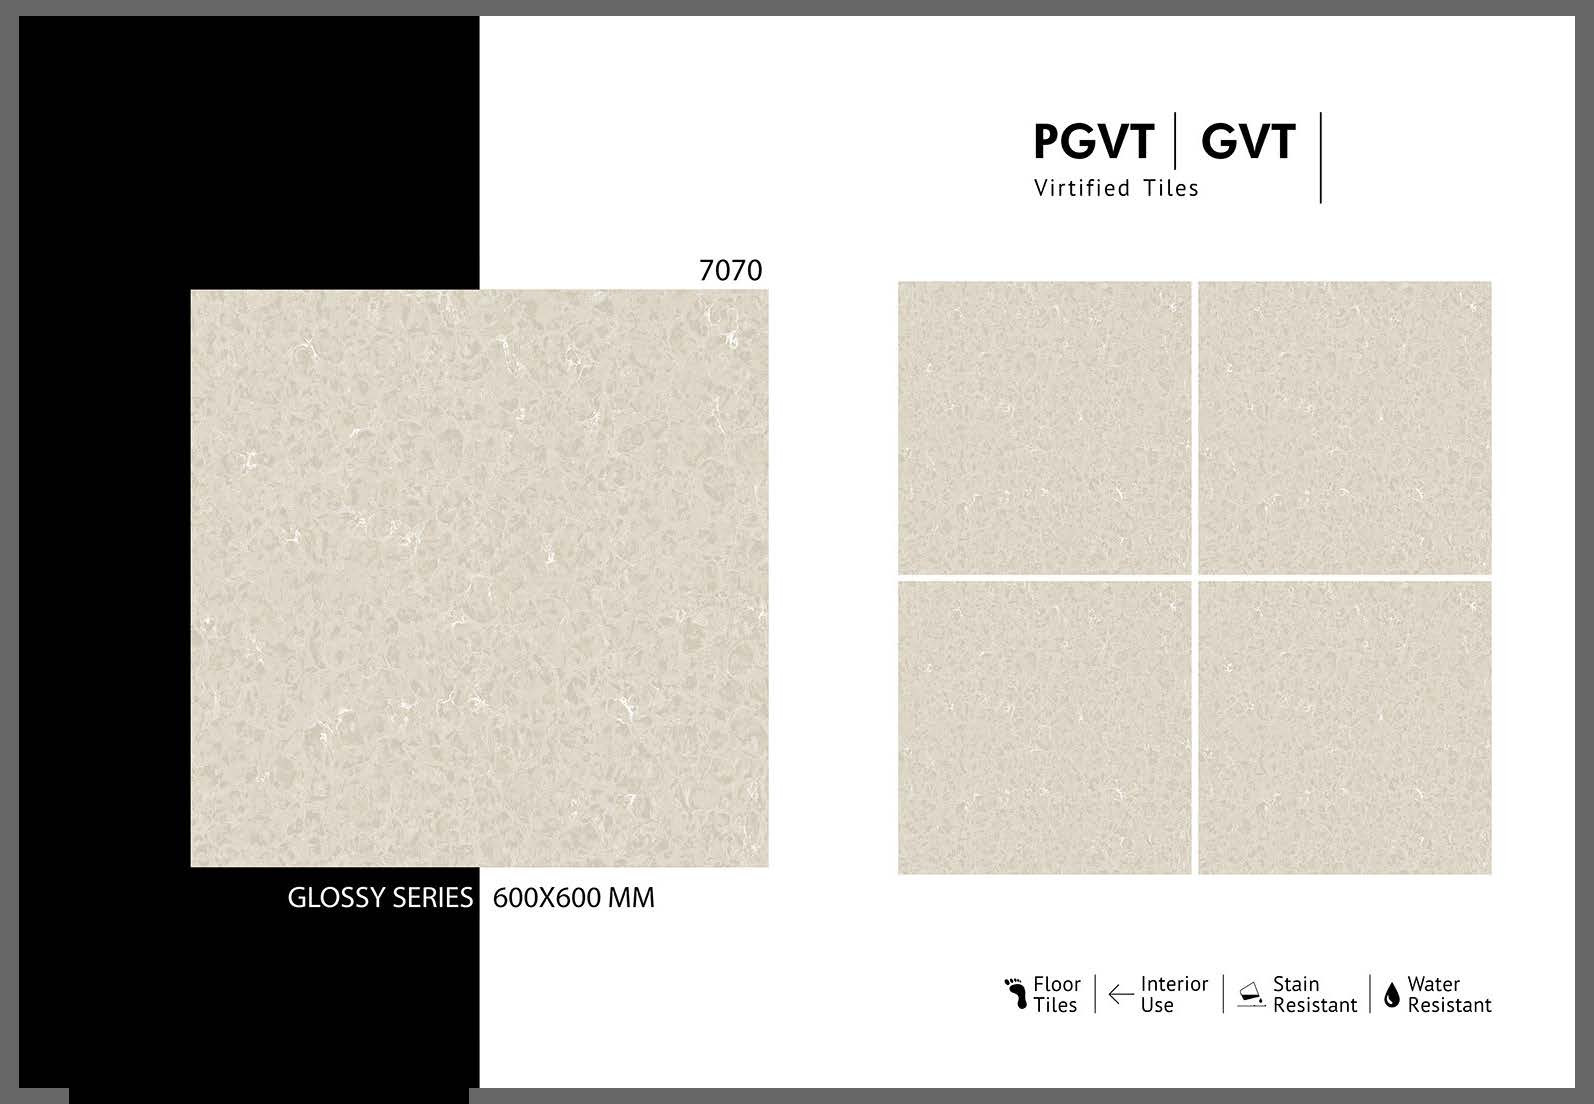 GVT 2X2 GLOSSY_Page_57.jpg